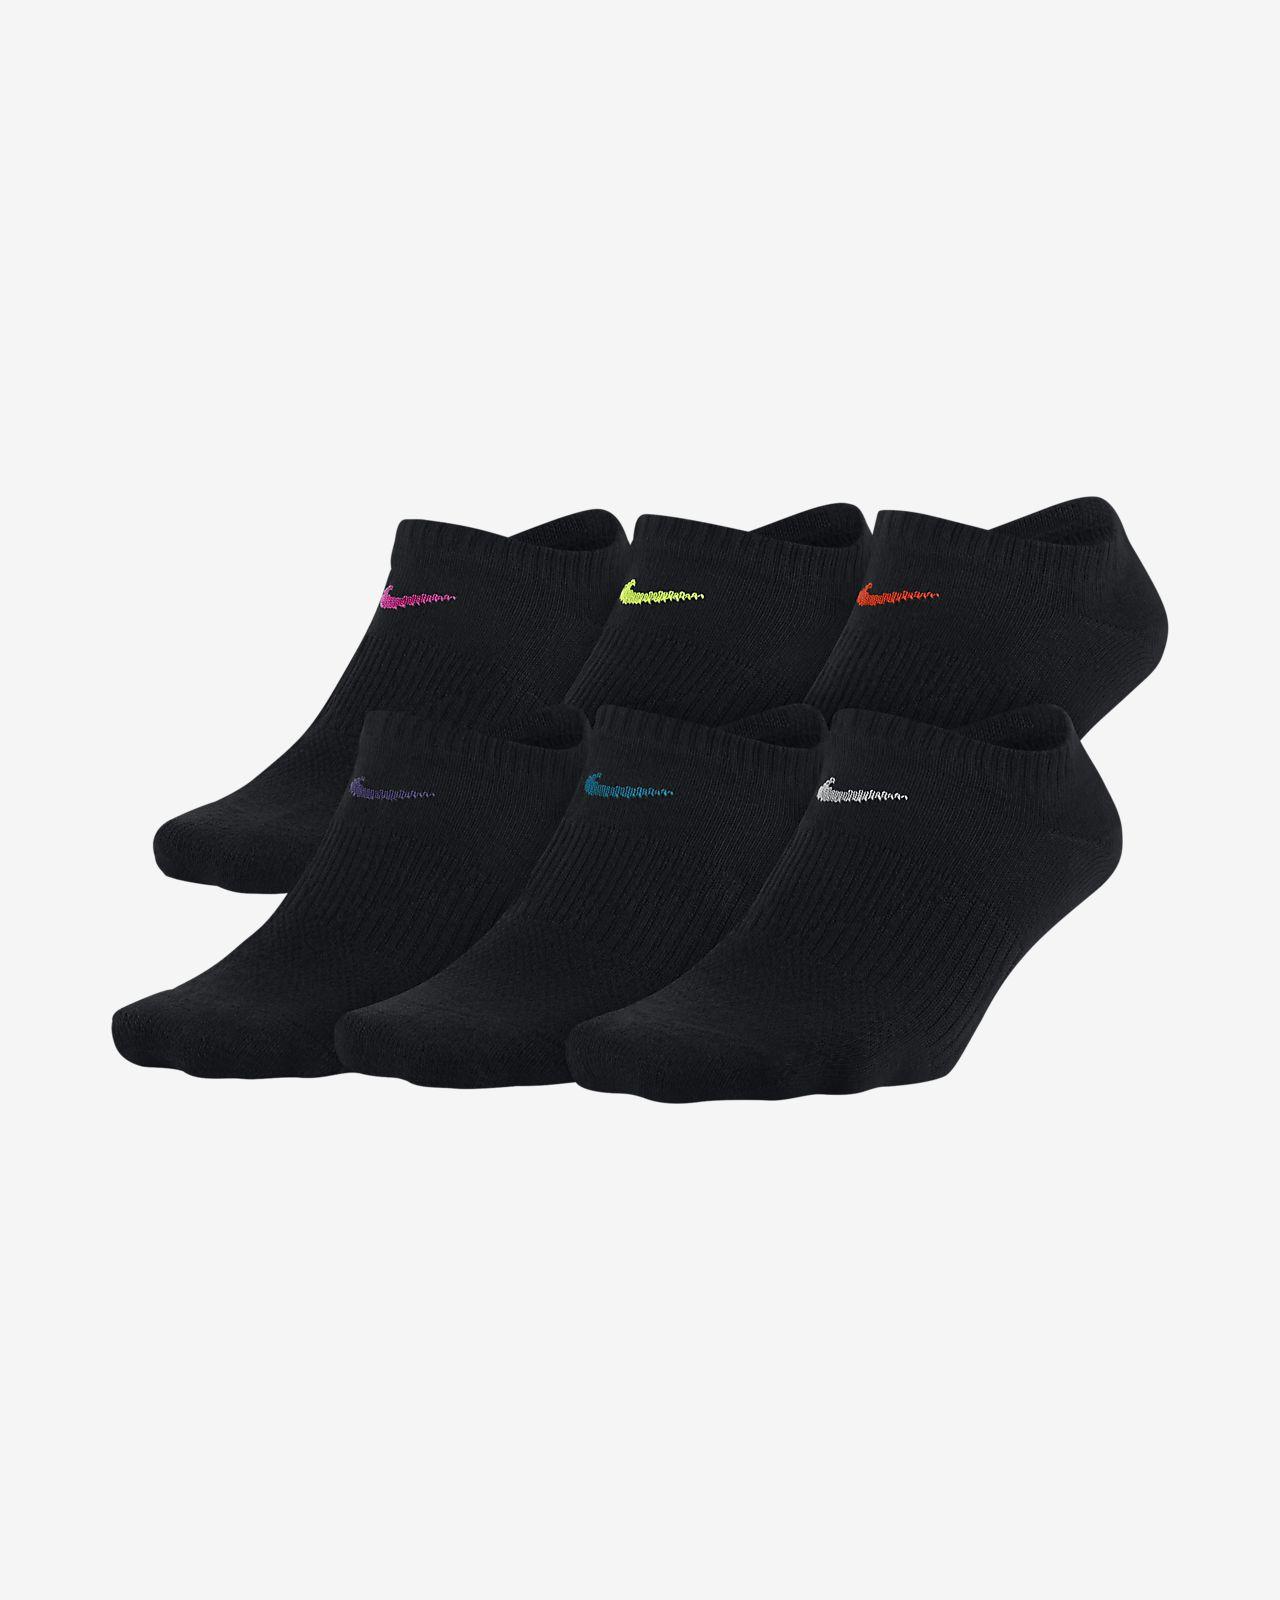 Nike Performance Lightweight No-Show Training Socks (6 Pair)